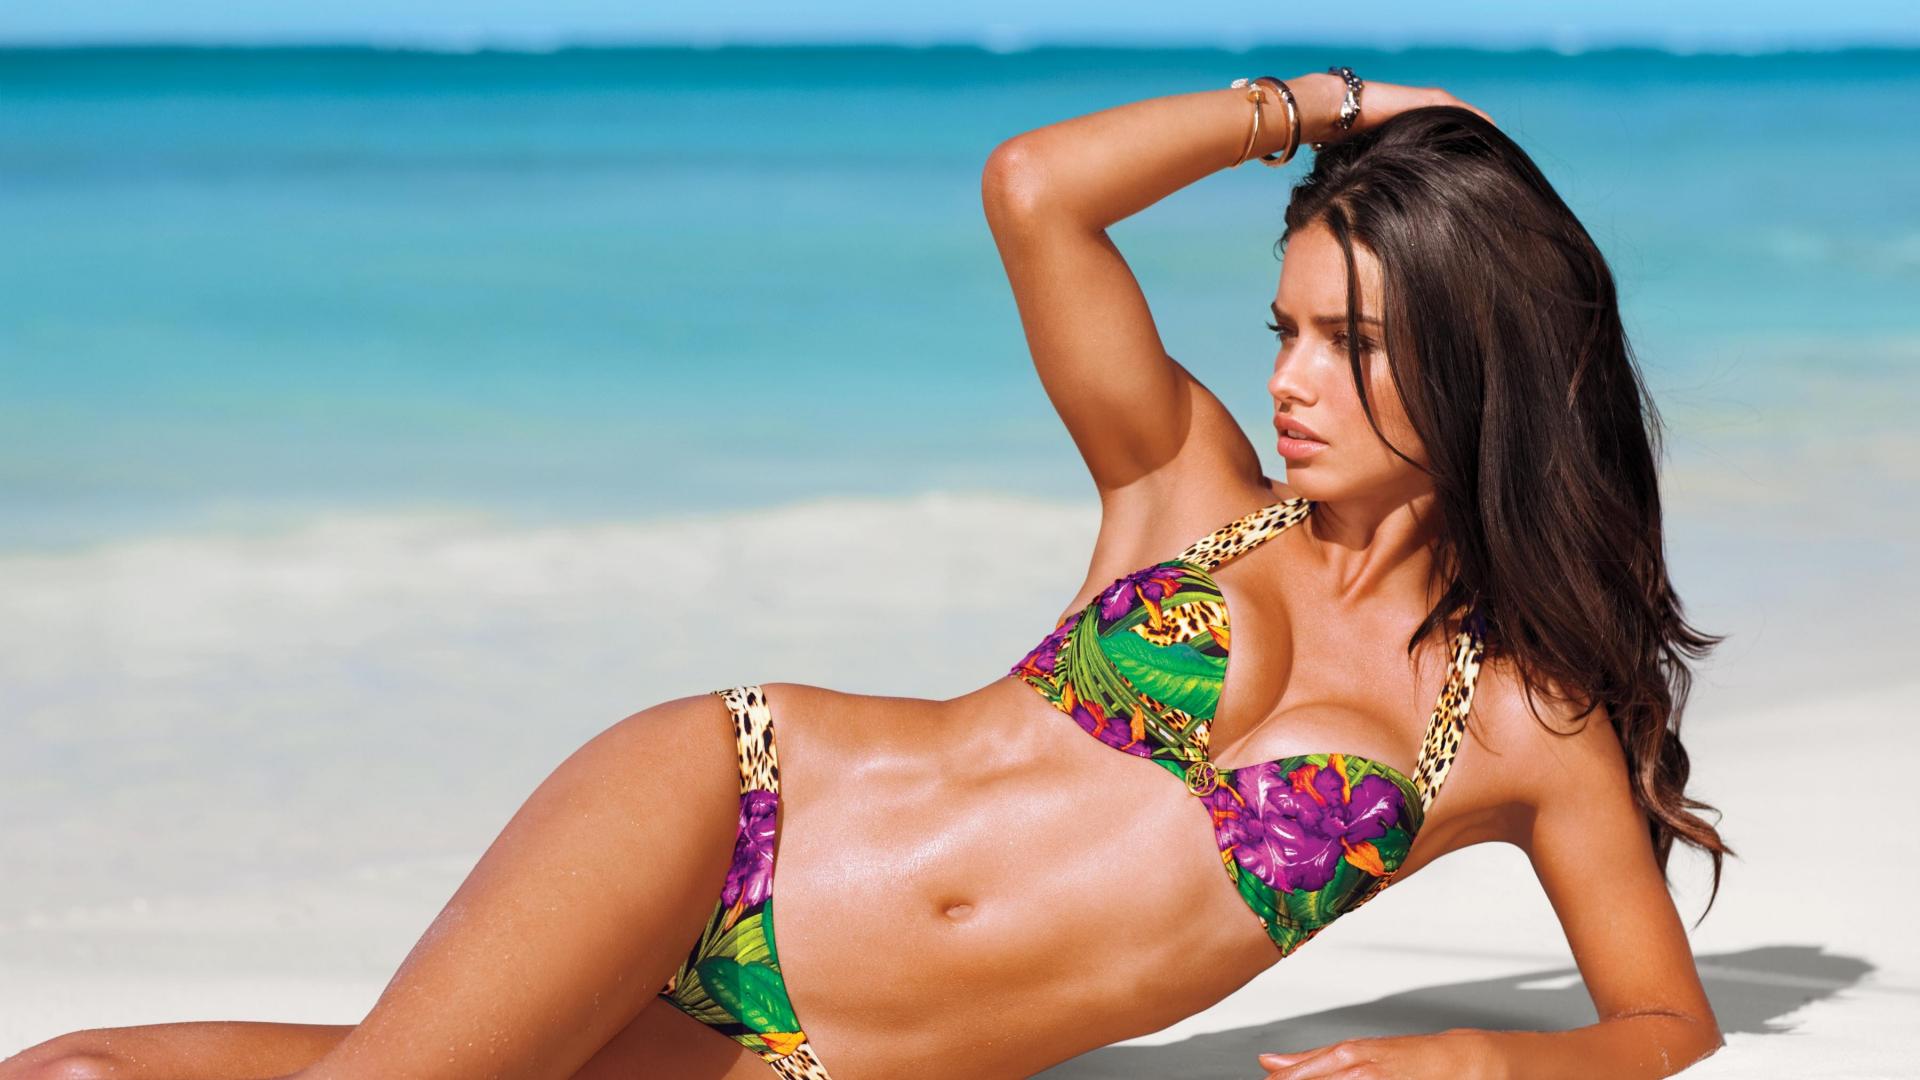 Pornos videos adriana bikini lima fuck pussy